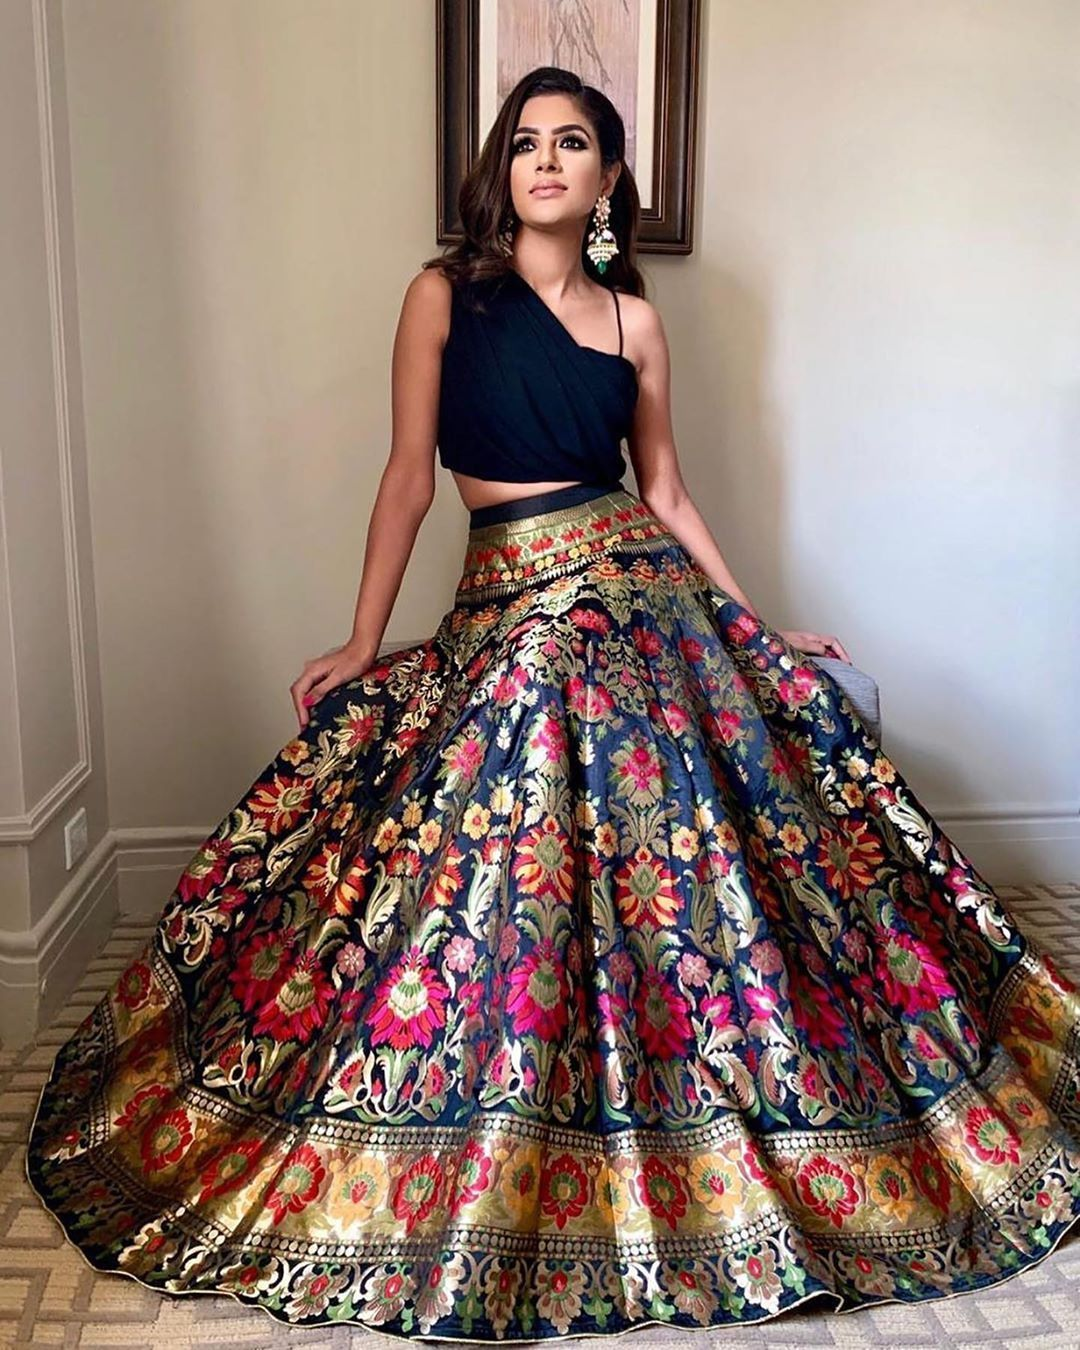 Multicoloured Bridal Skirt In 2020 Dress Indian Style Indian Bridal Outfits Indian Lehenga Choli